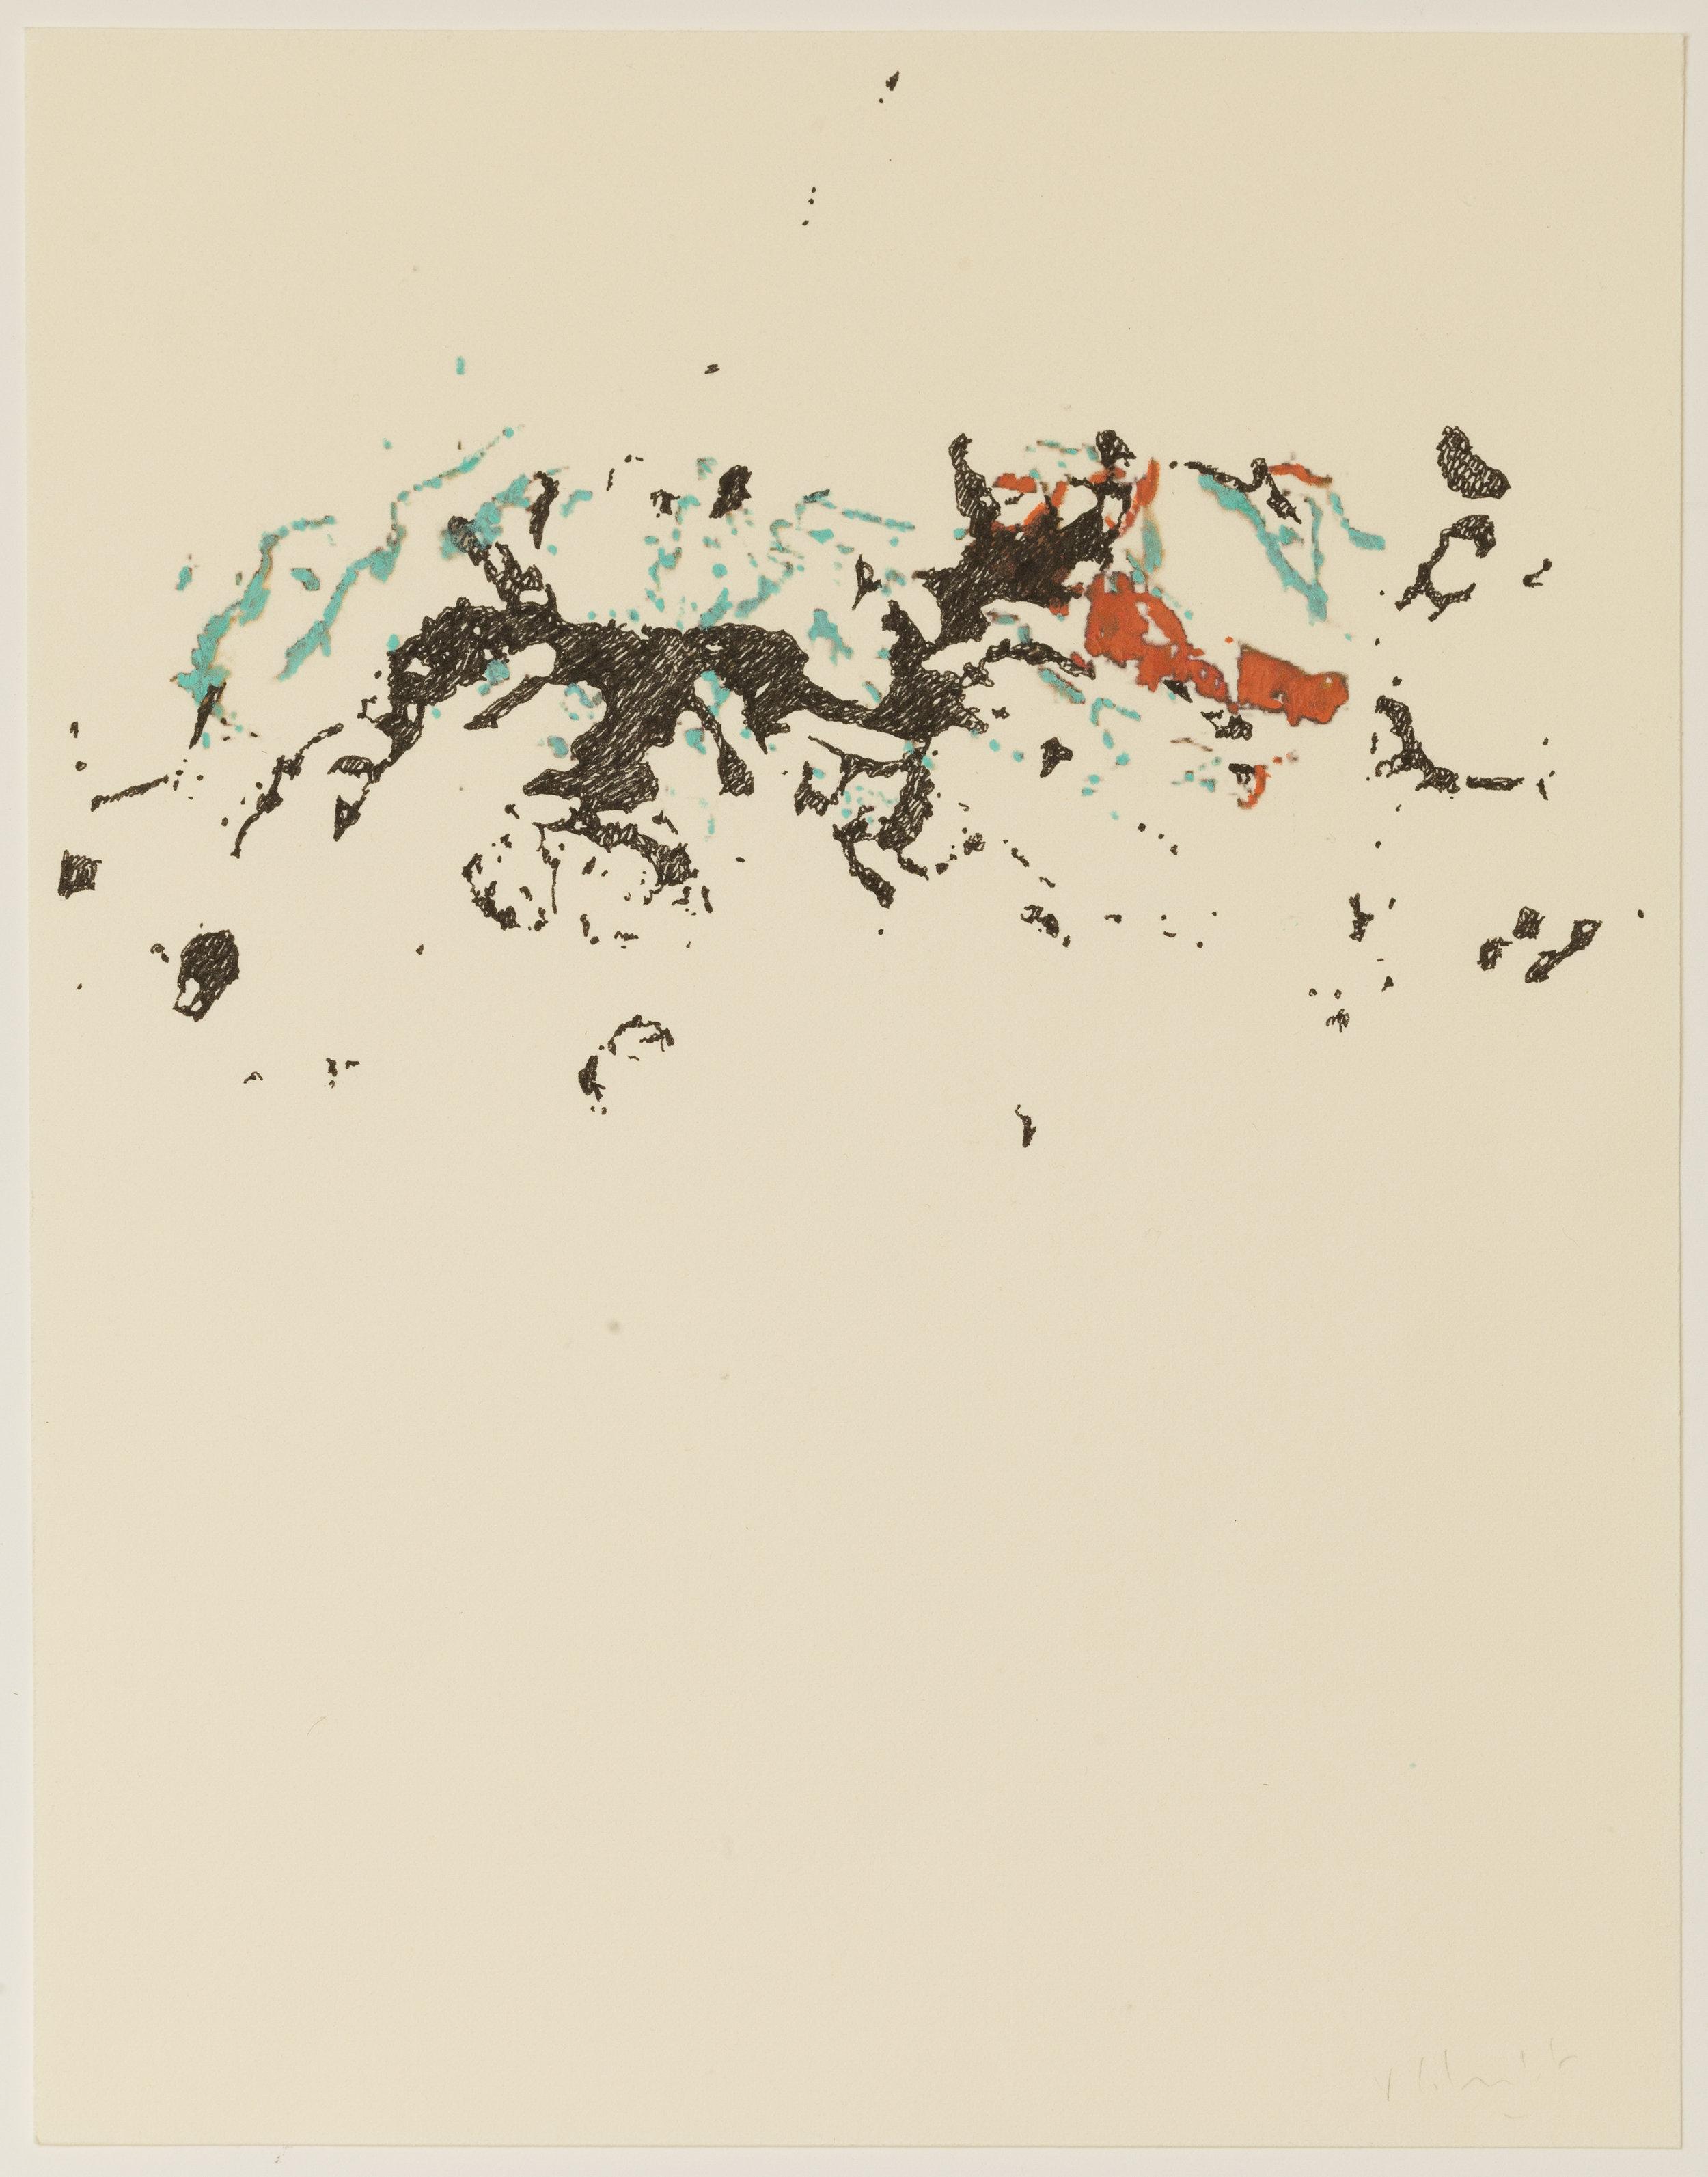 """Très Riches Heures- November""  2015 Coloring pencils on Rives Dimension: 10""1/2 x 8""1/4 — 27 x 21 cm"